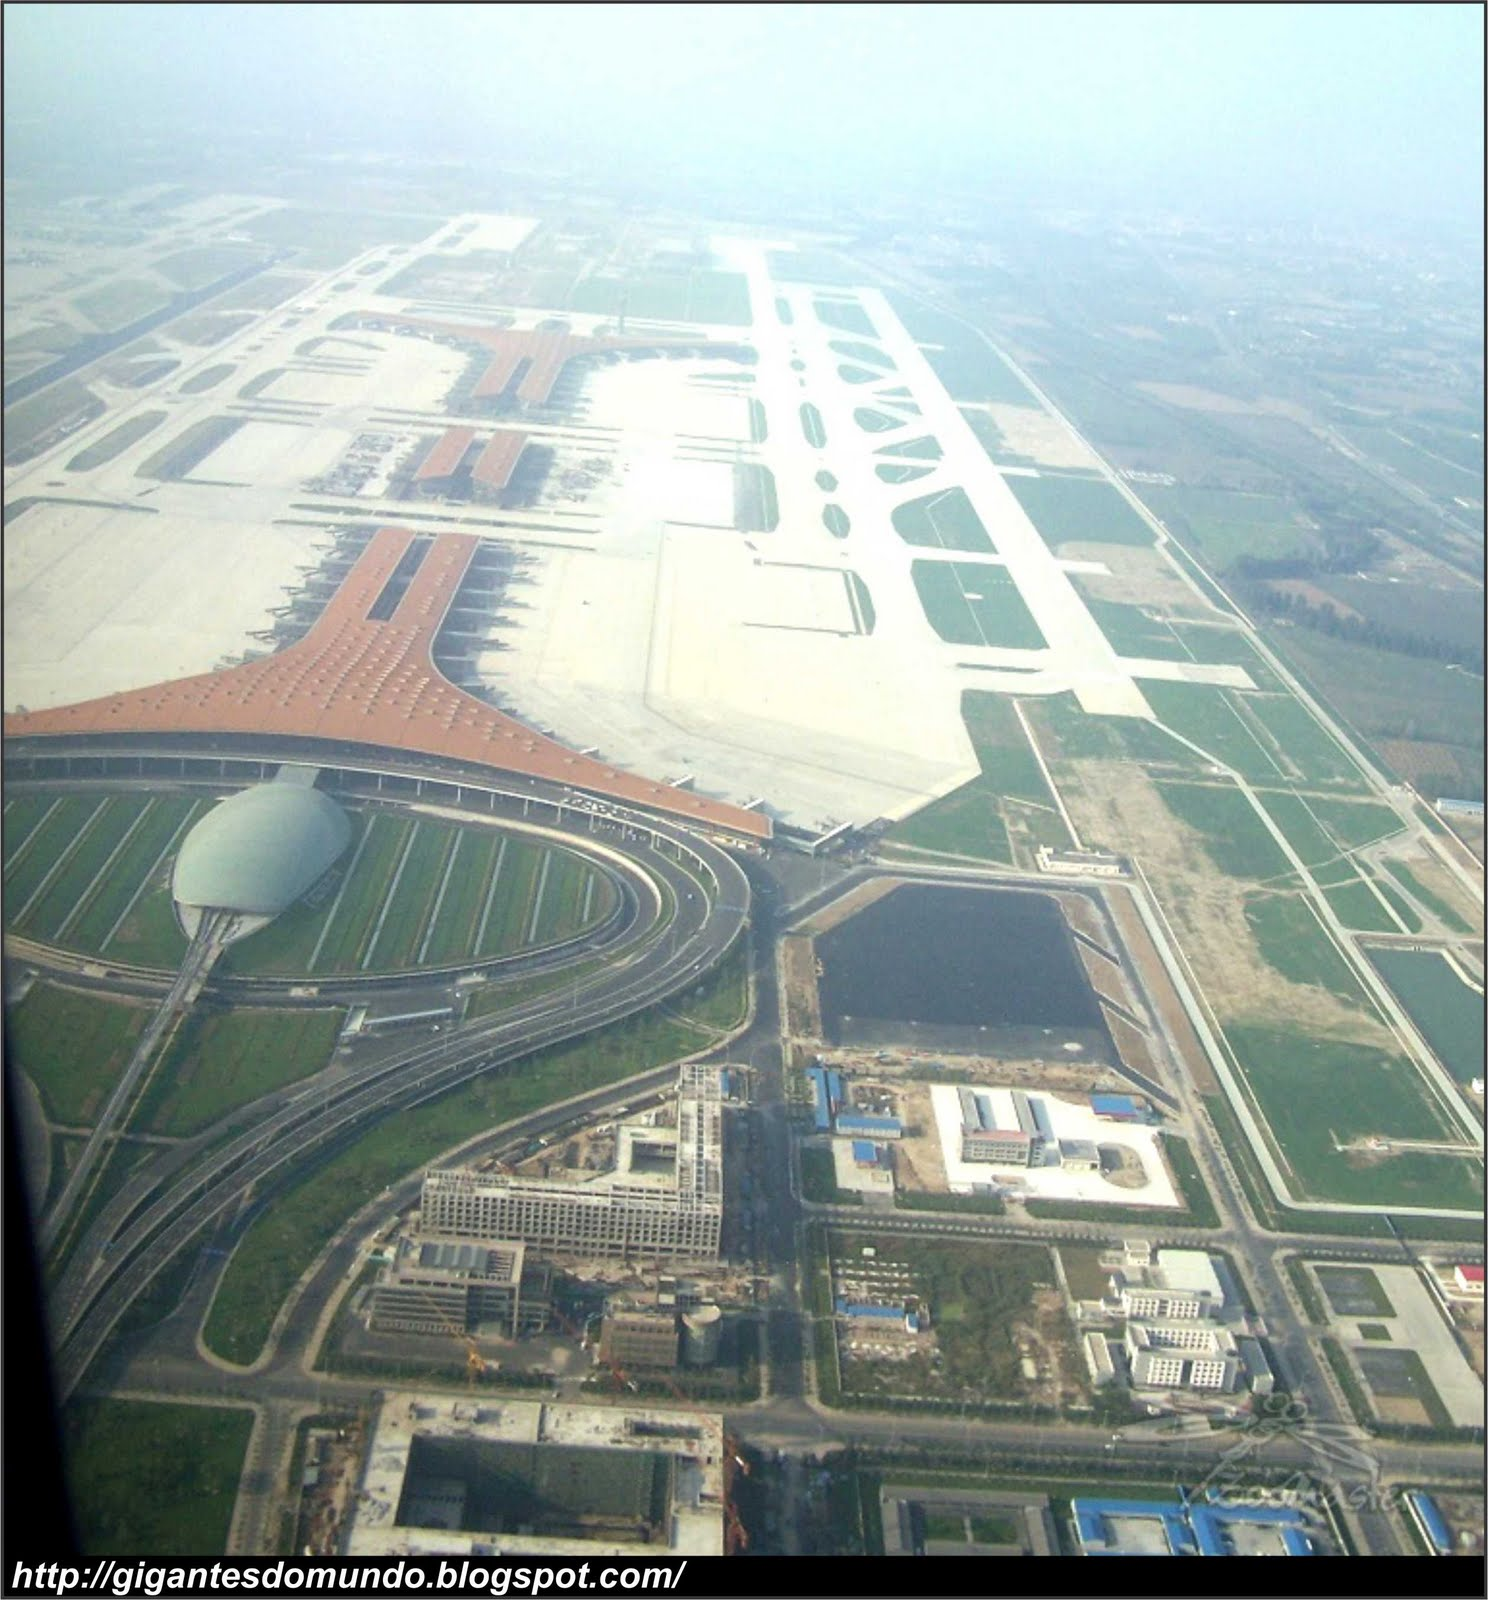 Aeroporto Do : O maior aeroporto do mundo gigantes do mundo